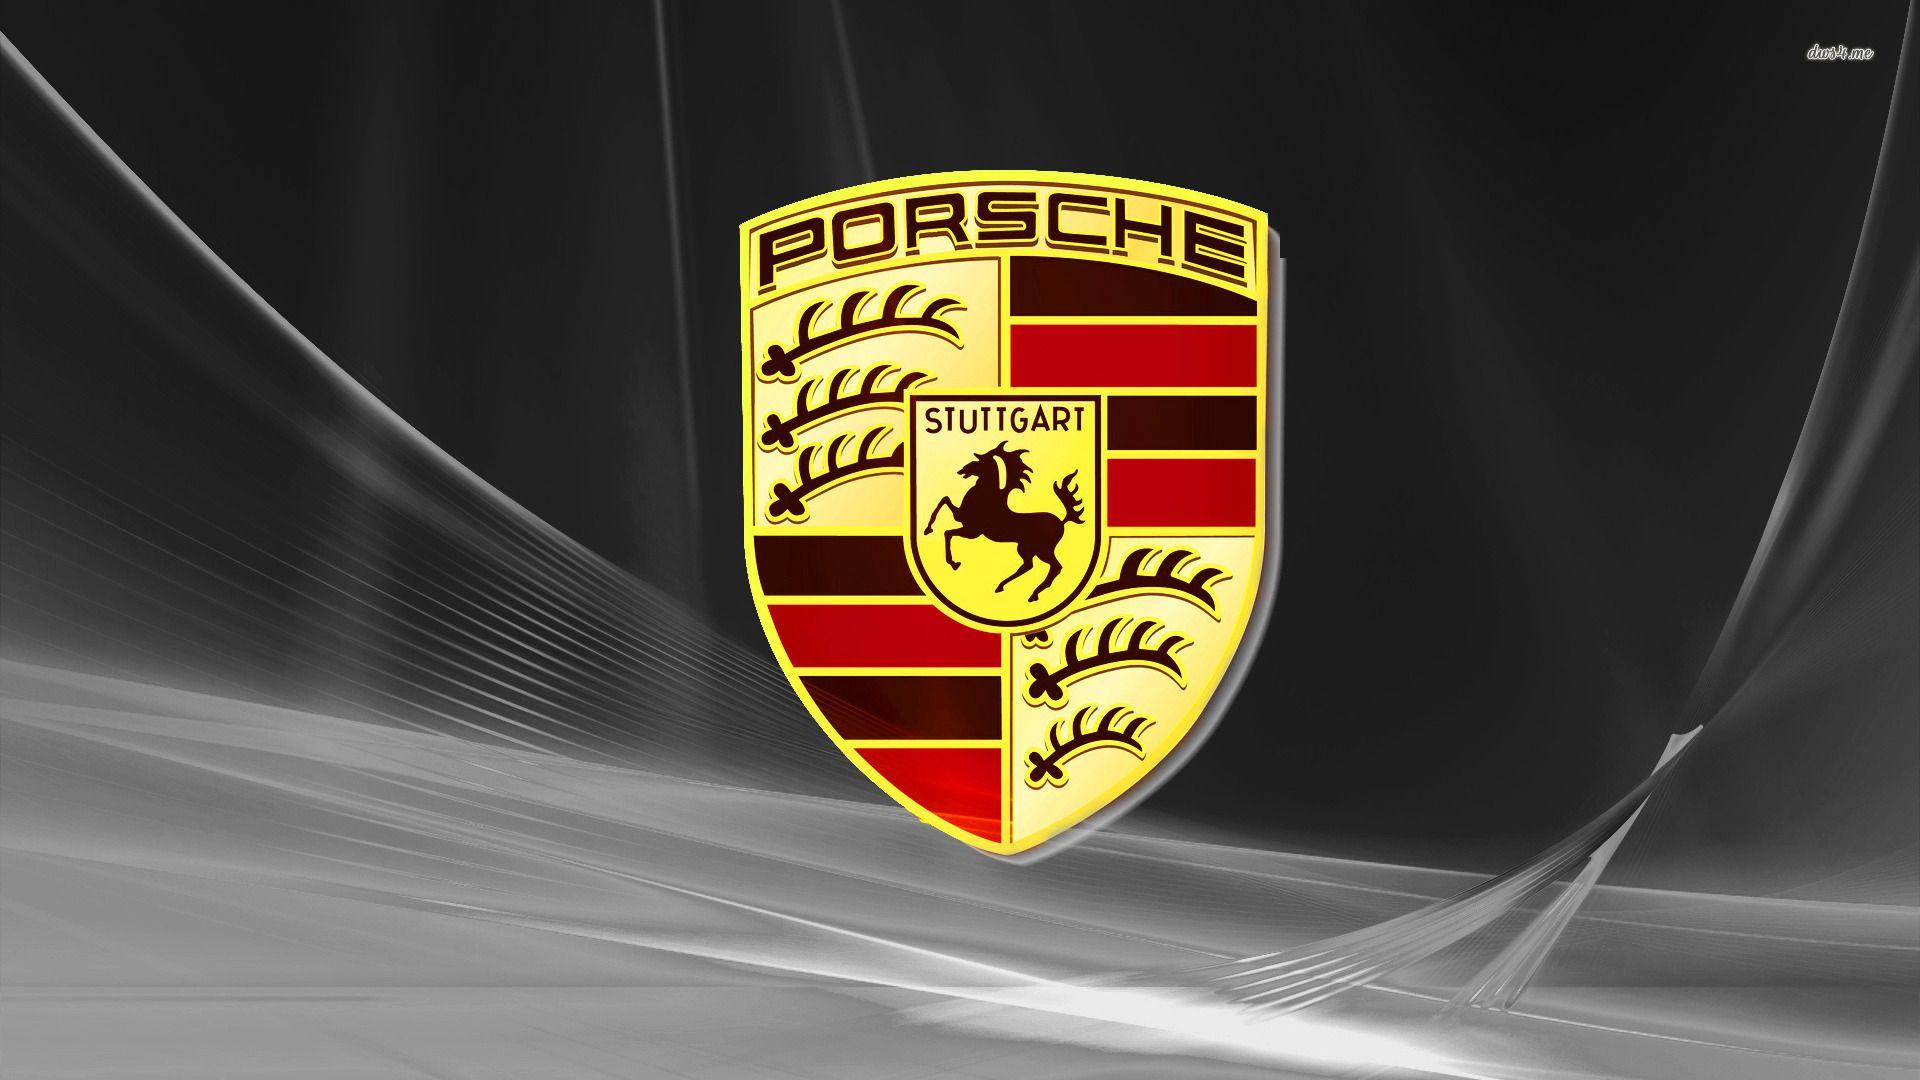 porsche logo wallpaper 1920x1080 90